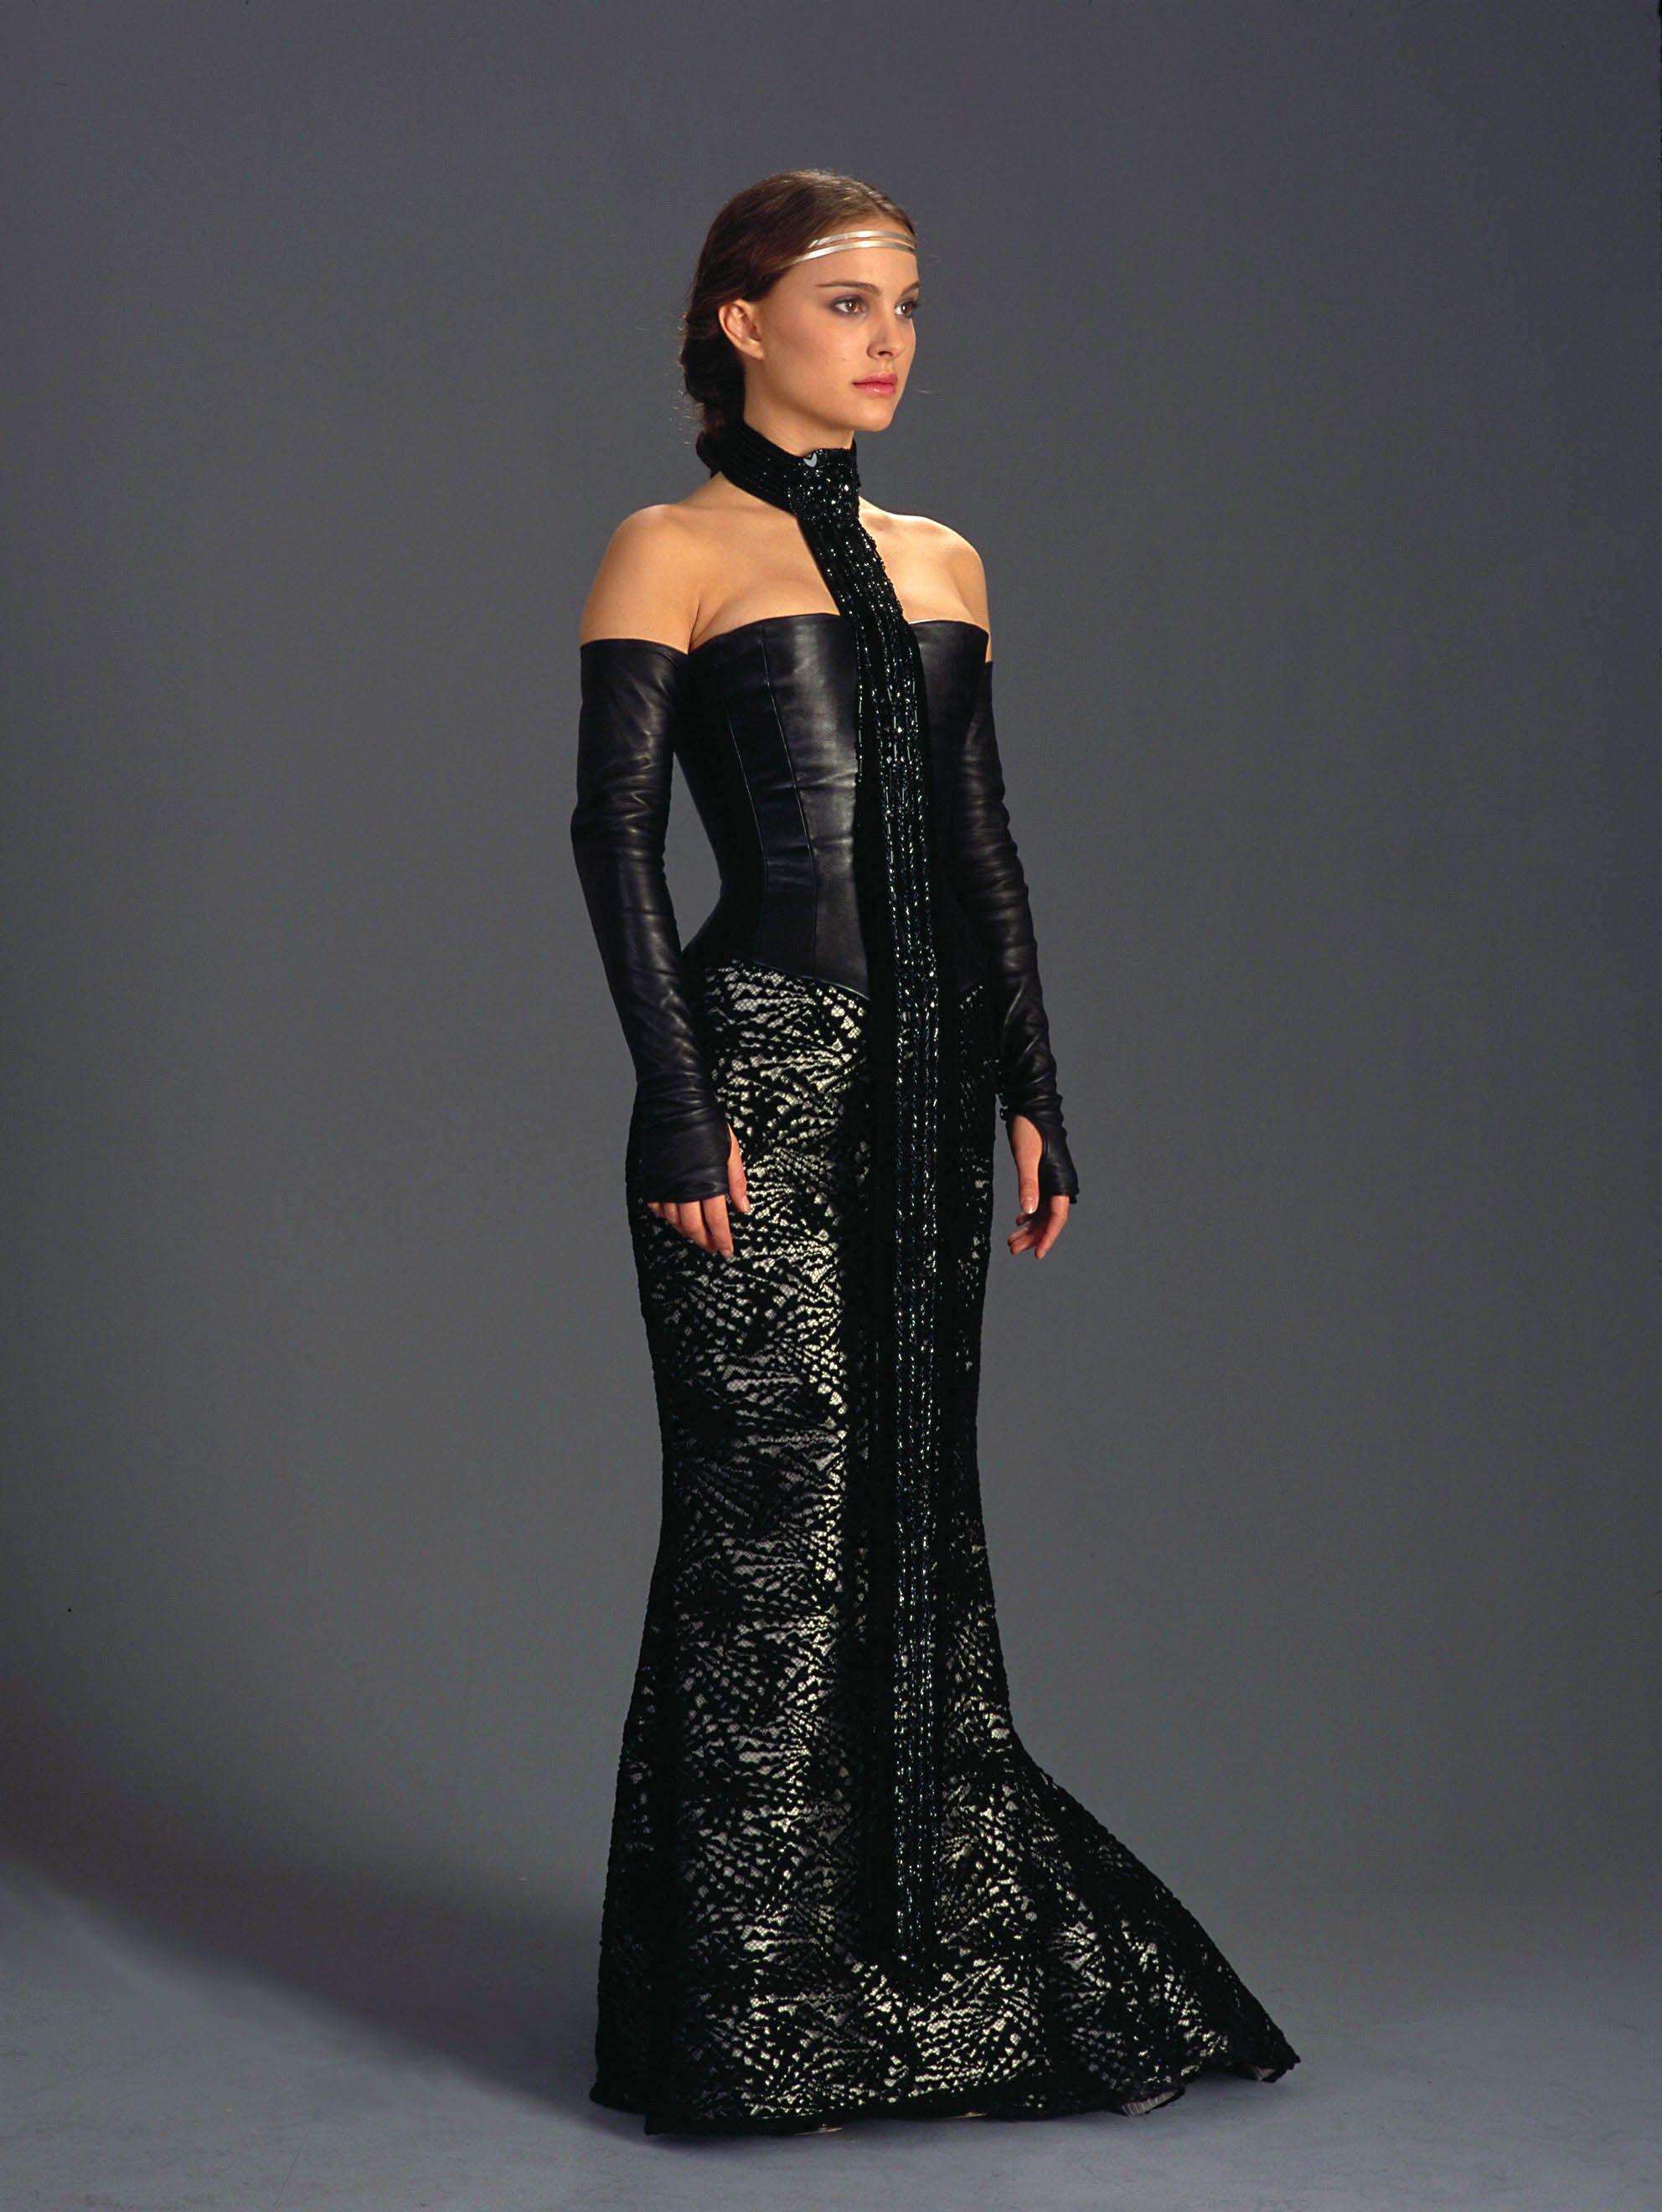 Senator Amidala Star Wars: Episode II - Attack Of The Clones | Star ...